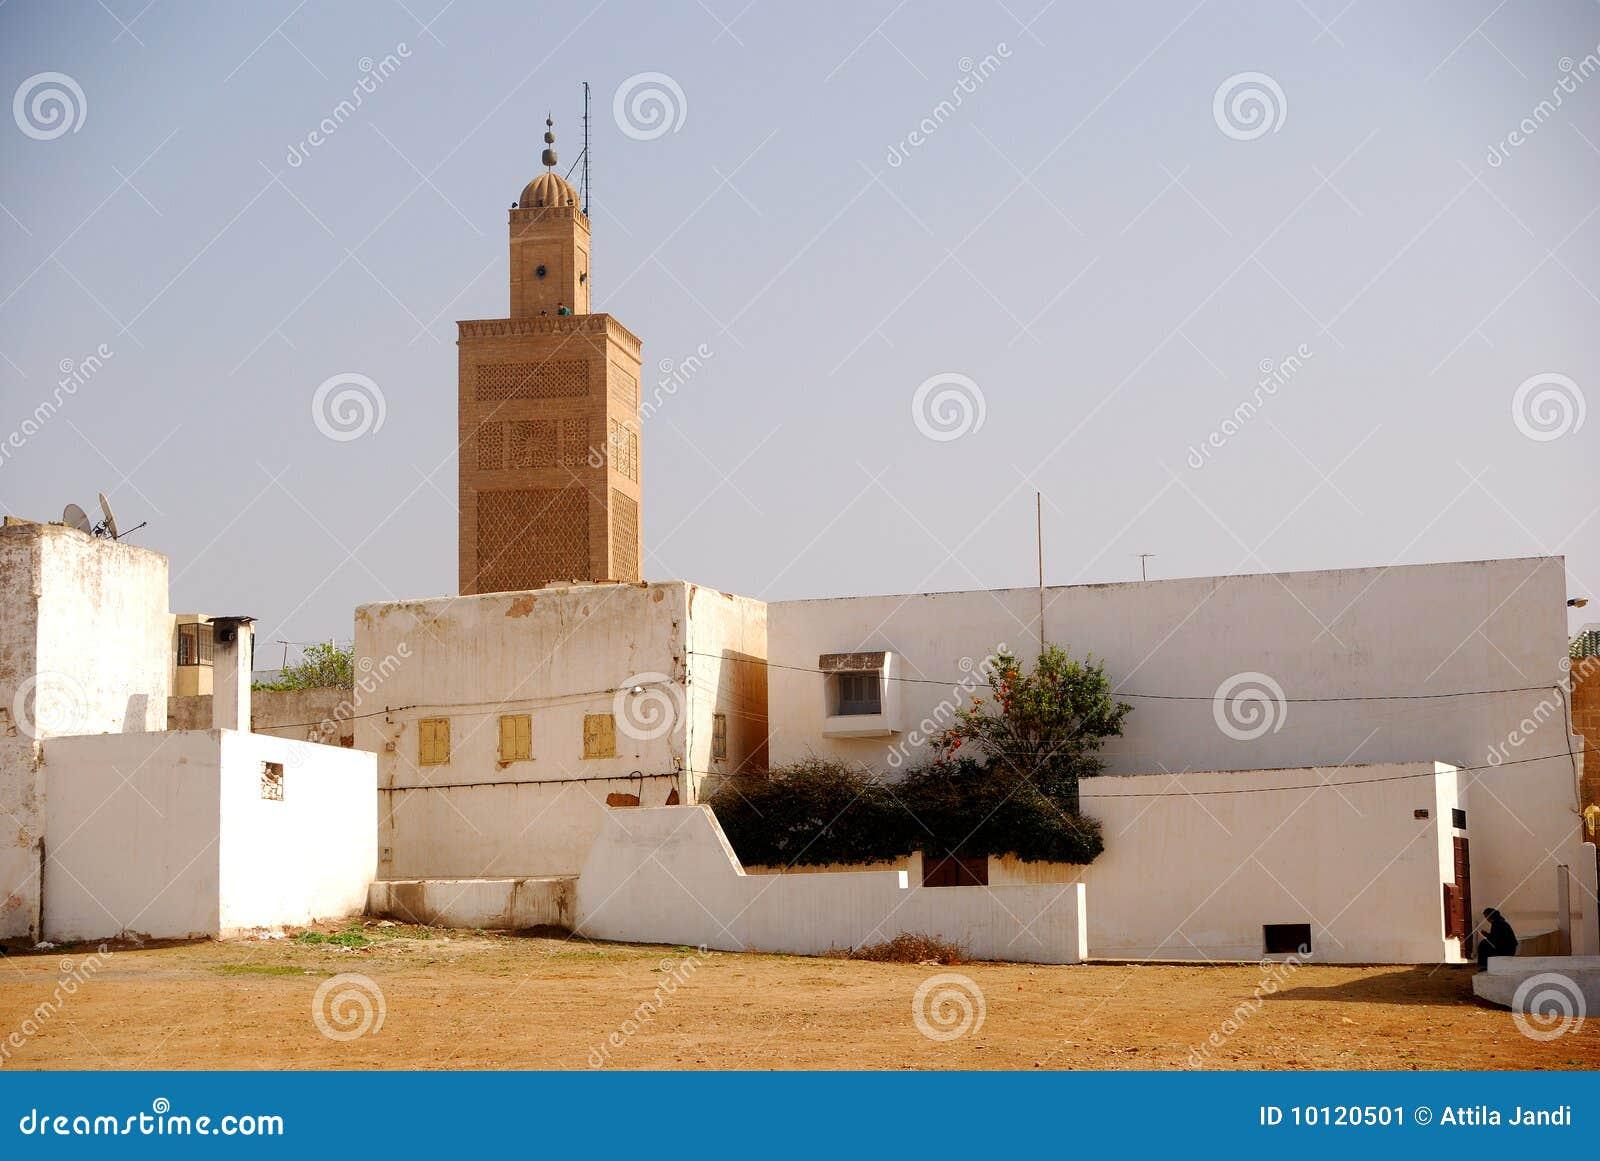 Grande moschea, vendita, Marocco